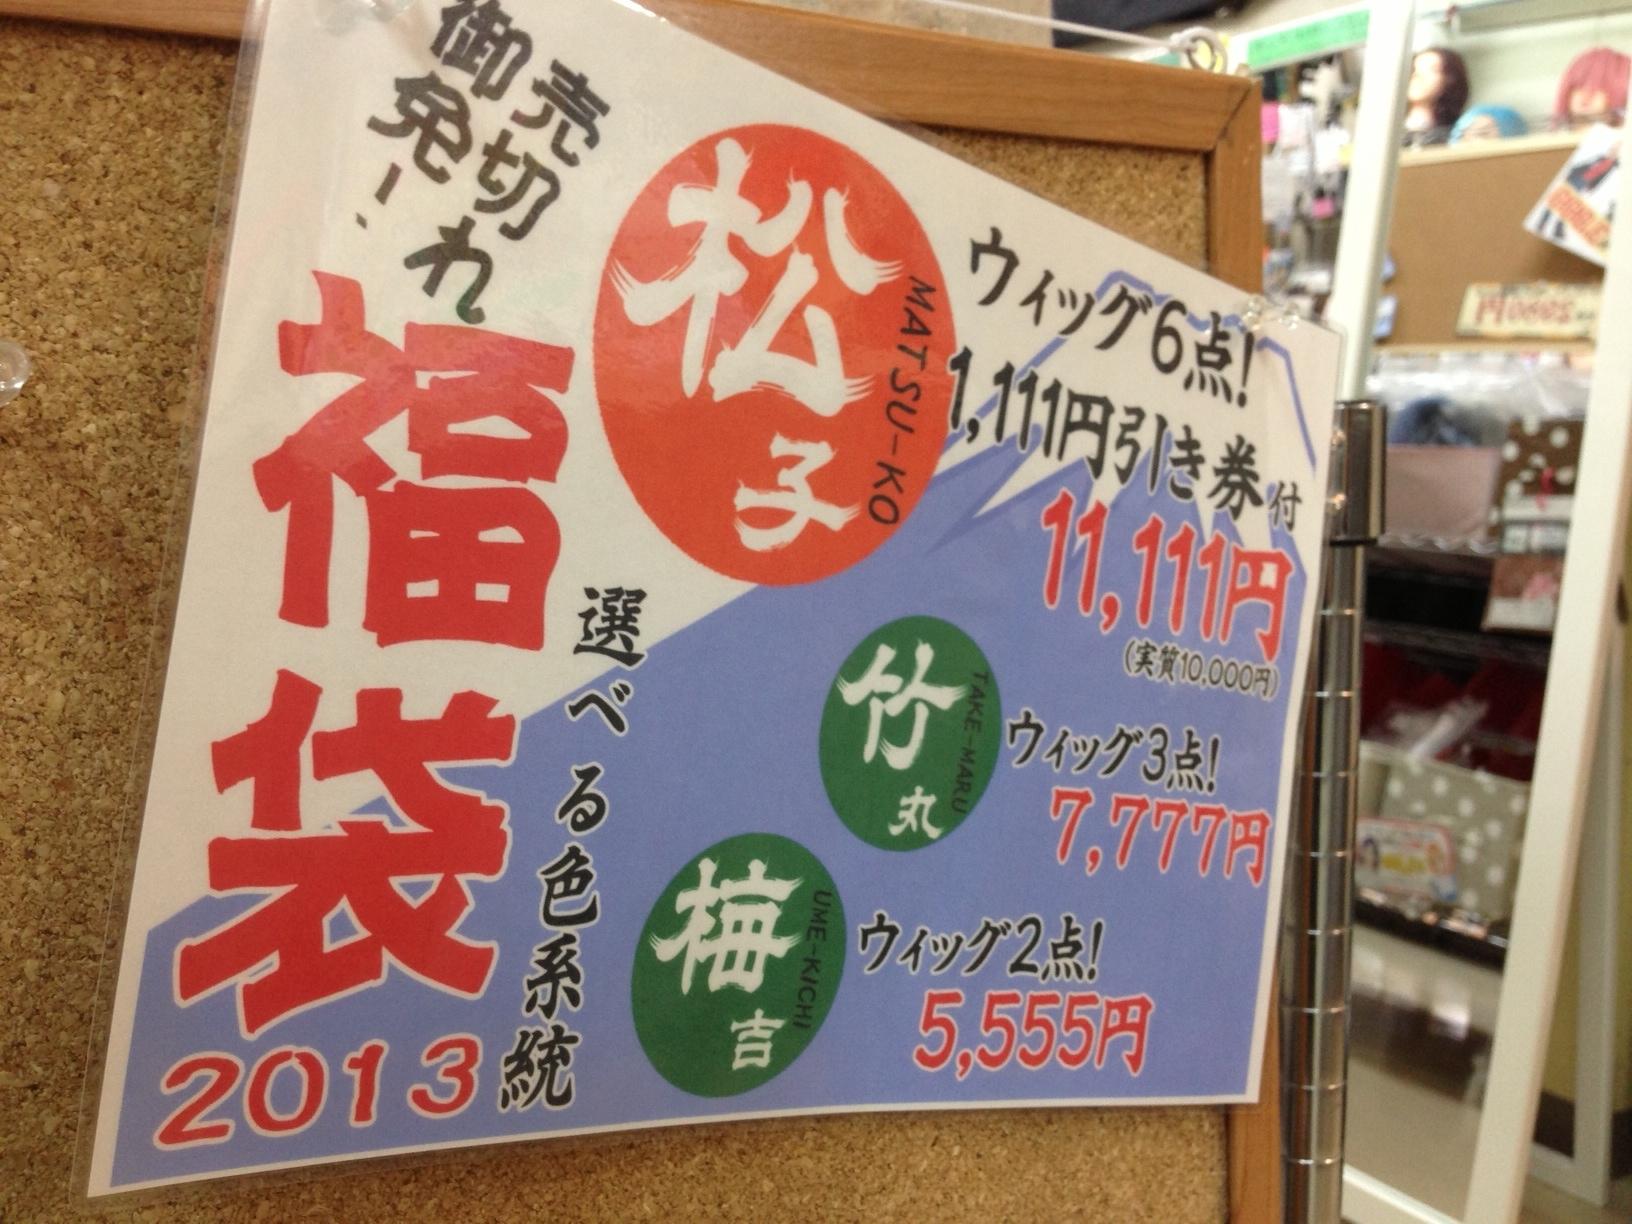 http://osaka-nihonbashi.anihiro.jp/images/2012123001.JPG